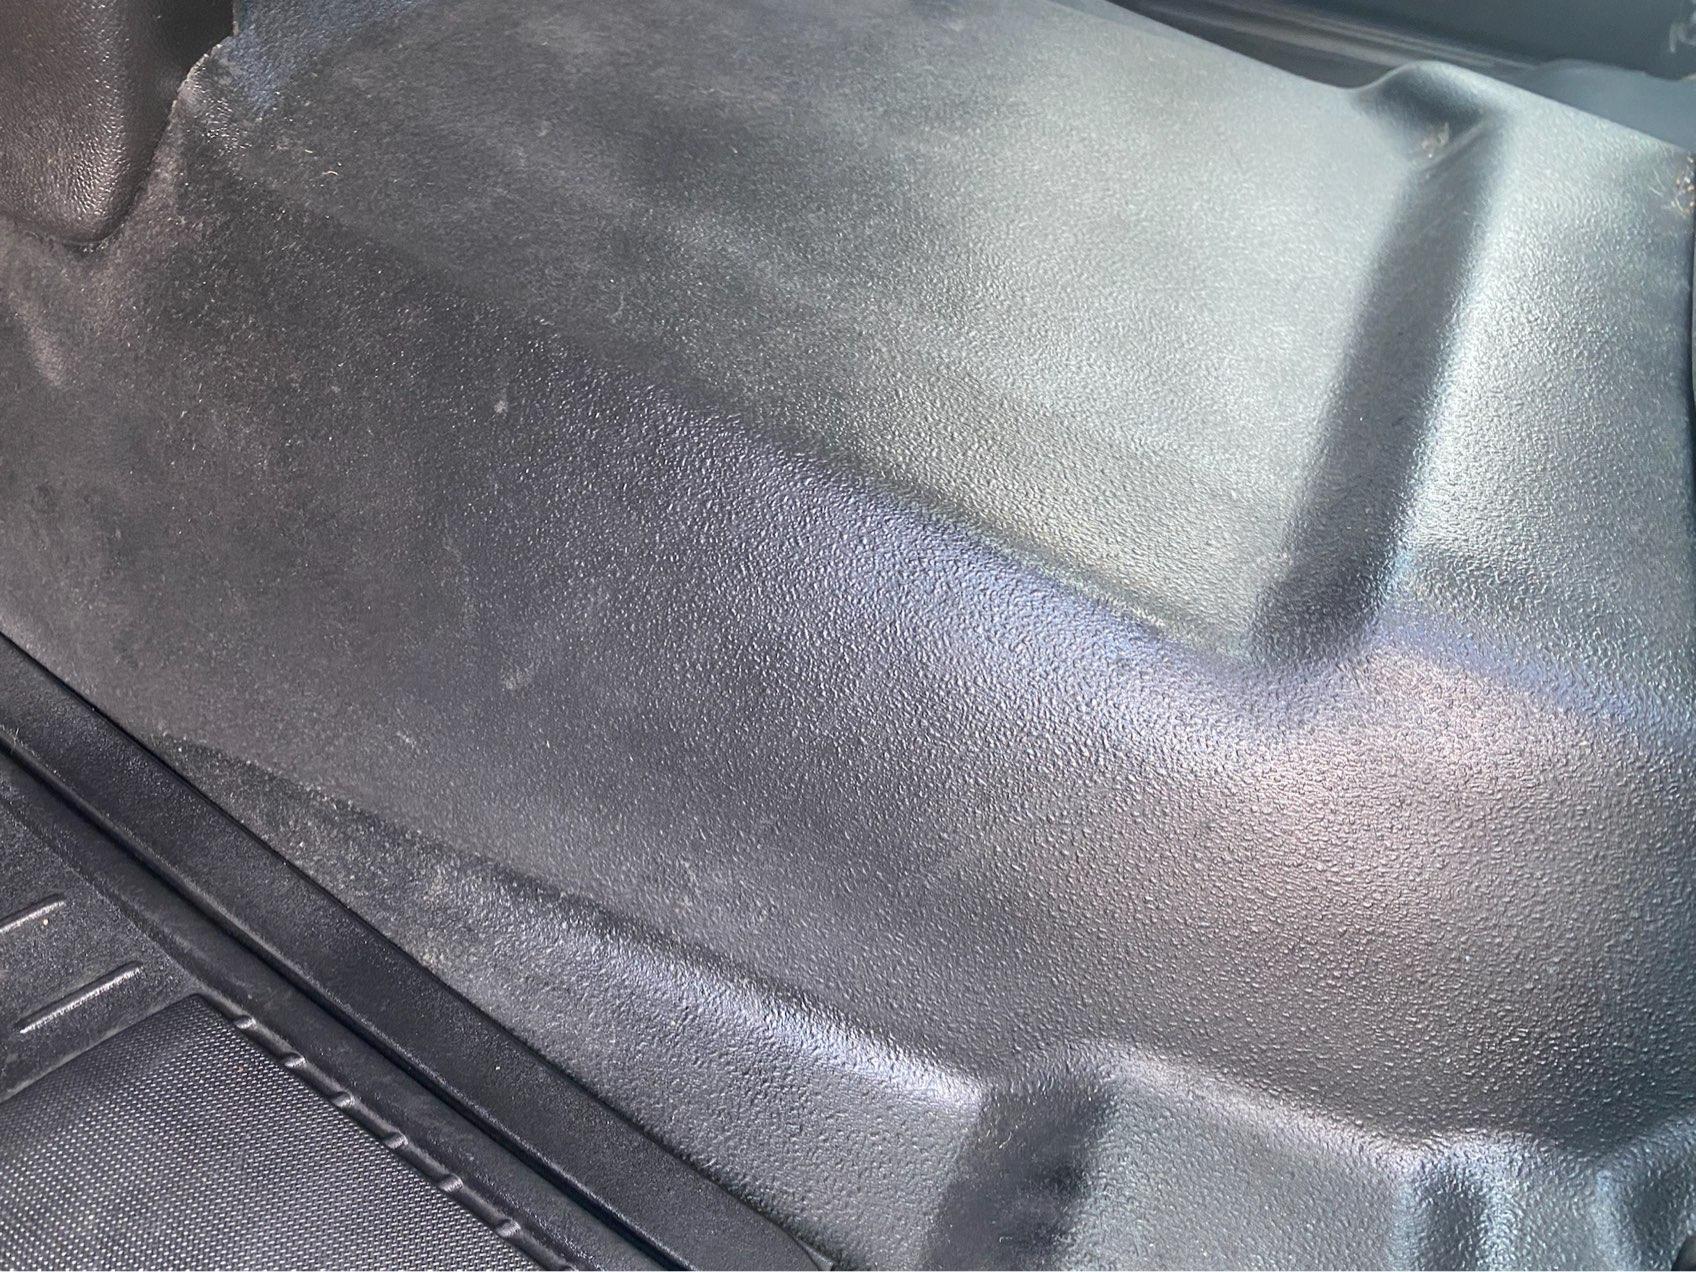 used vehicle - Truck CHEVROLET SILVERADO 2500HD 2016